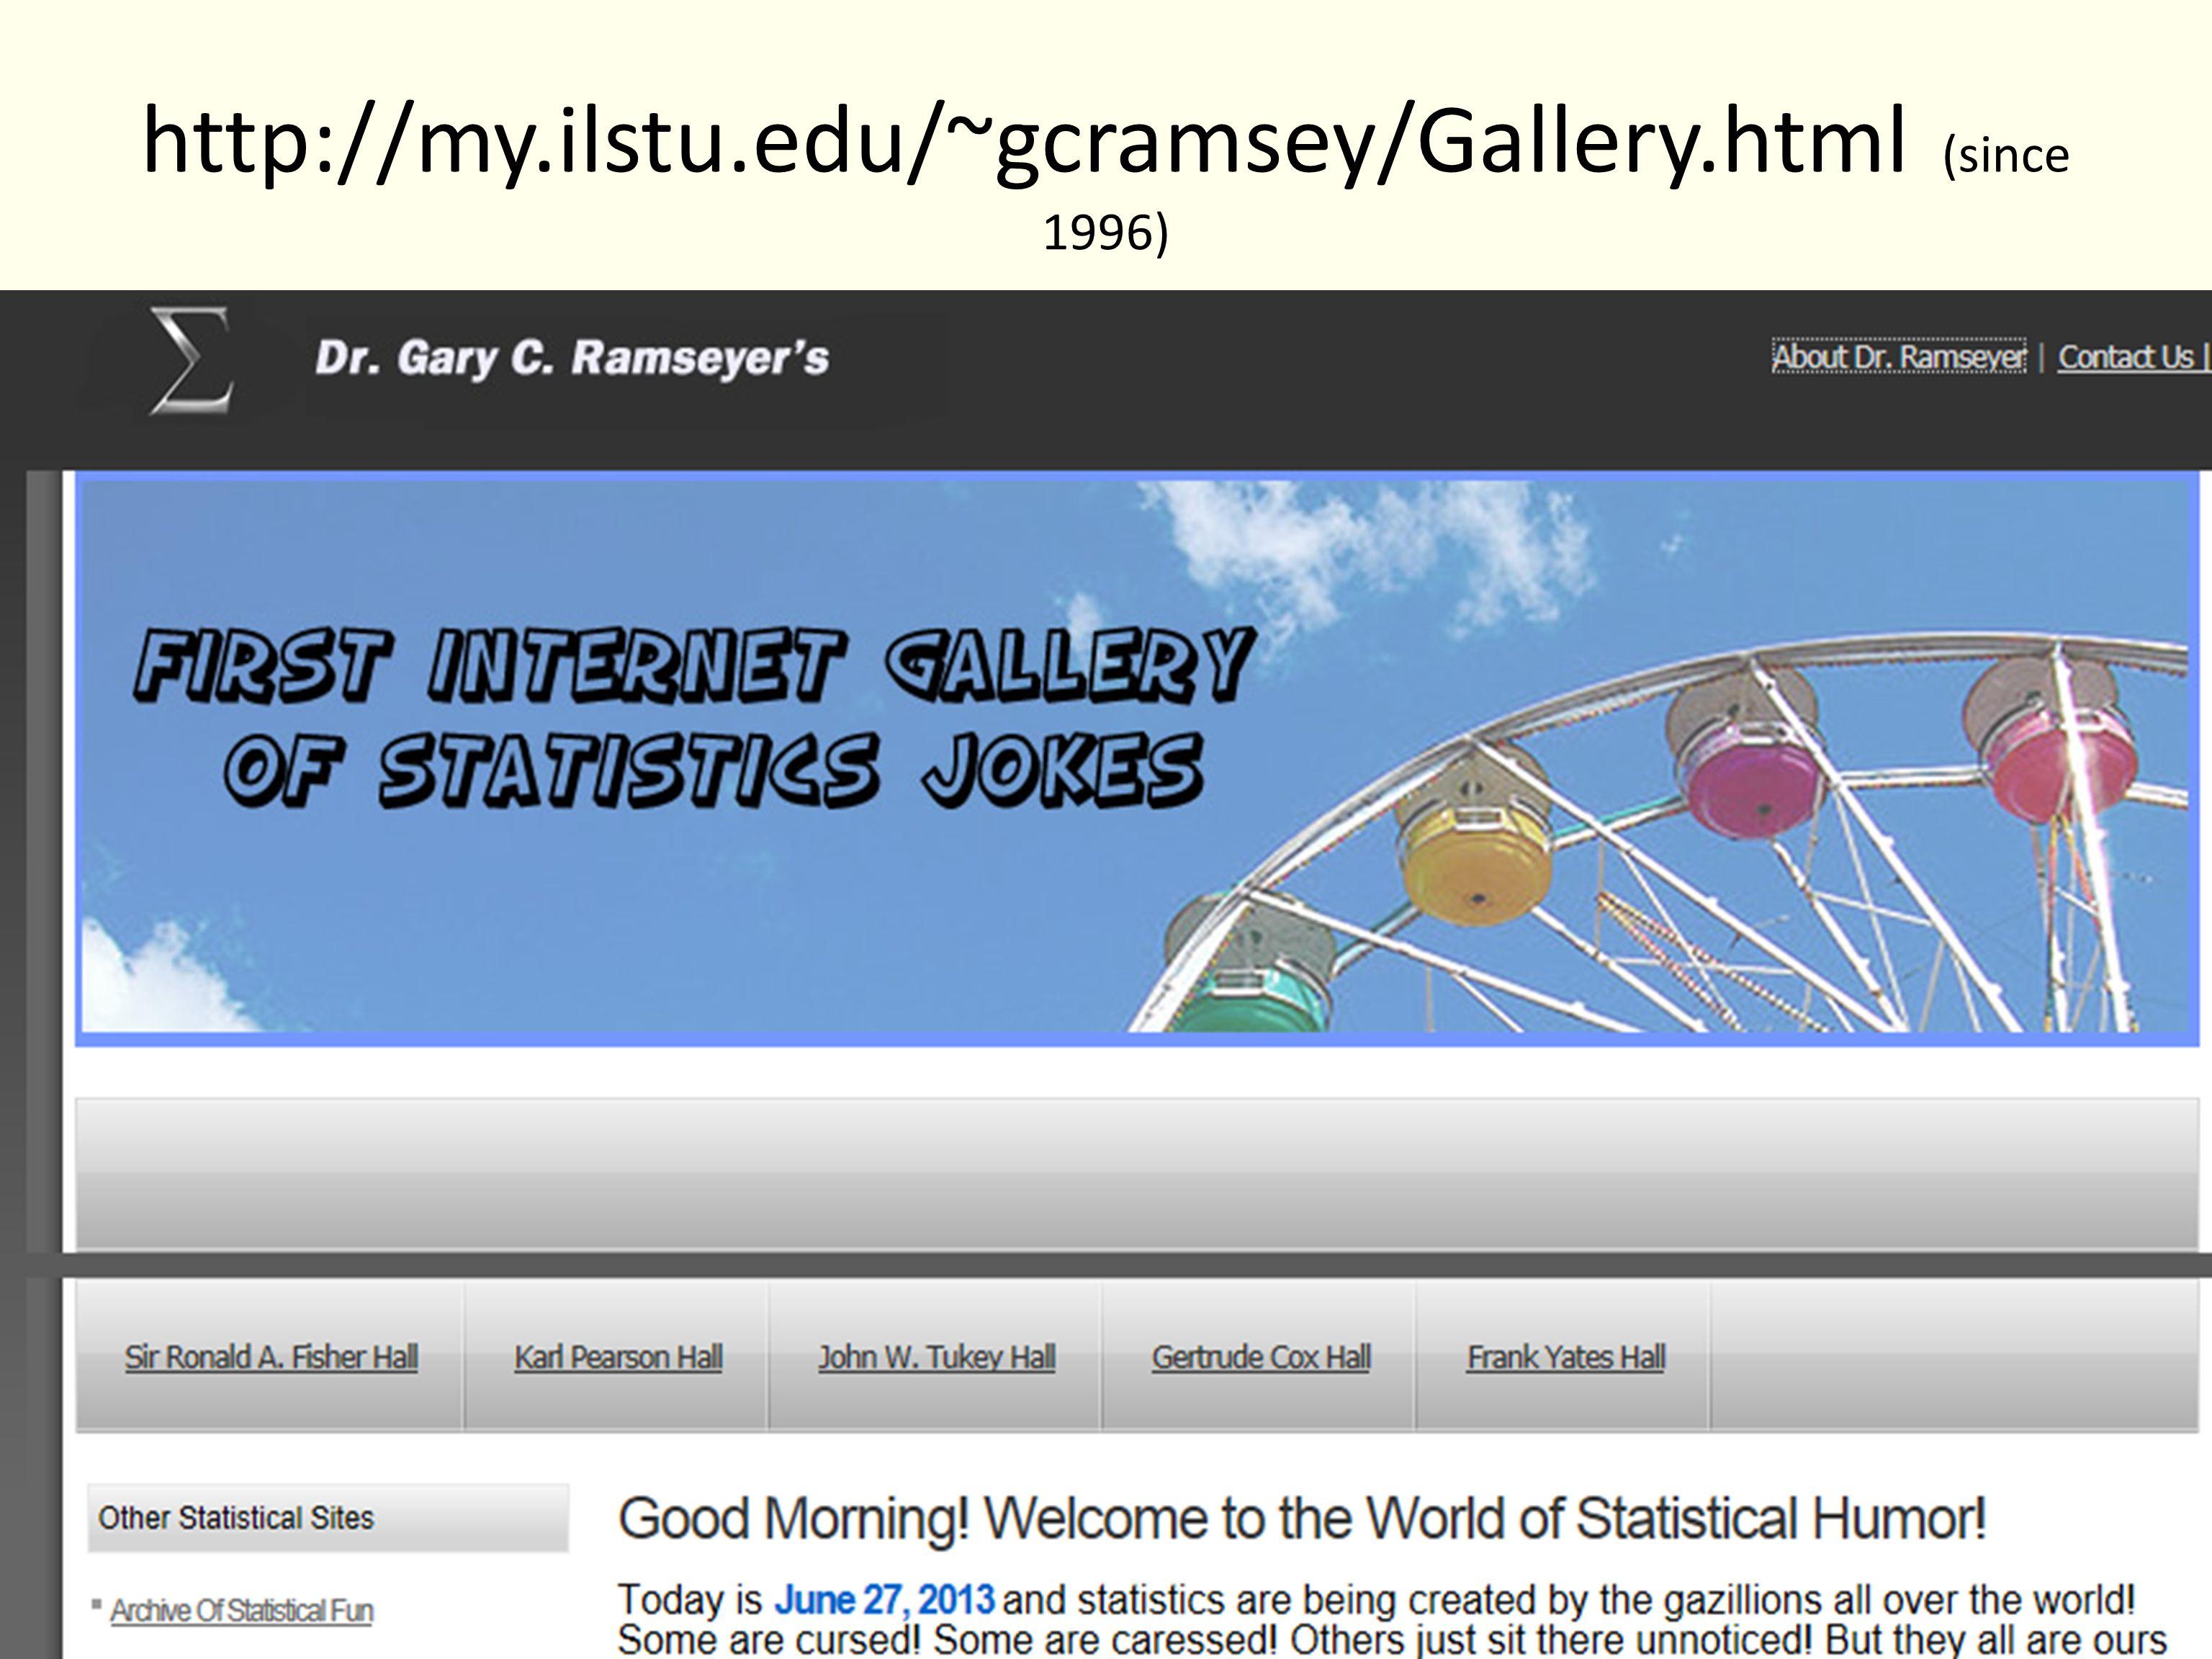 http://my.ilstu.edu/~gcramsey/Gallery.html (since 1996)